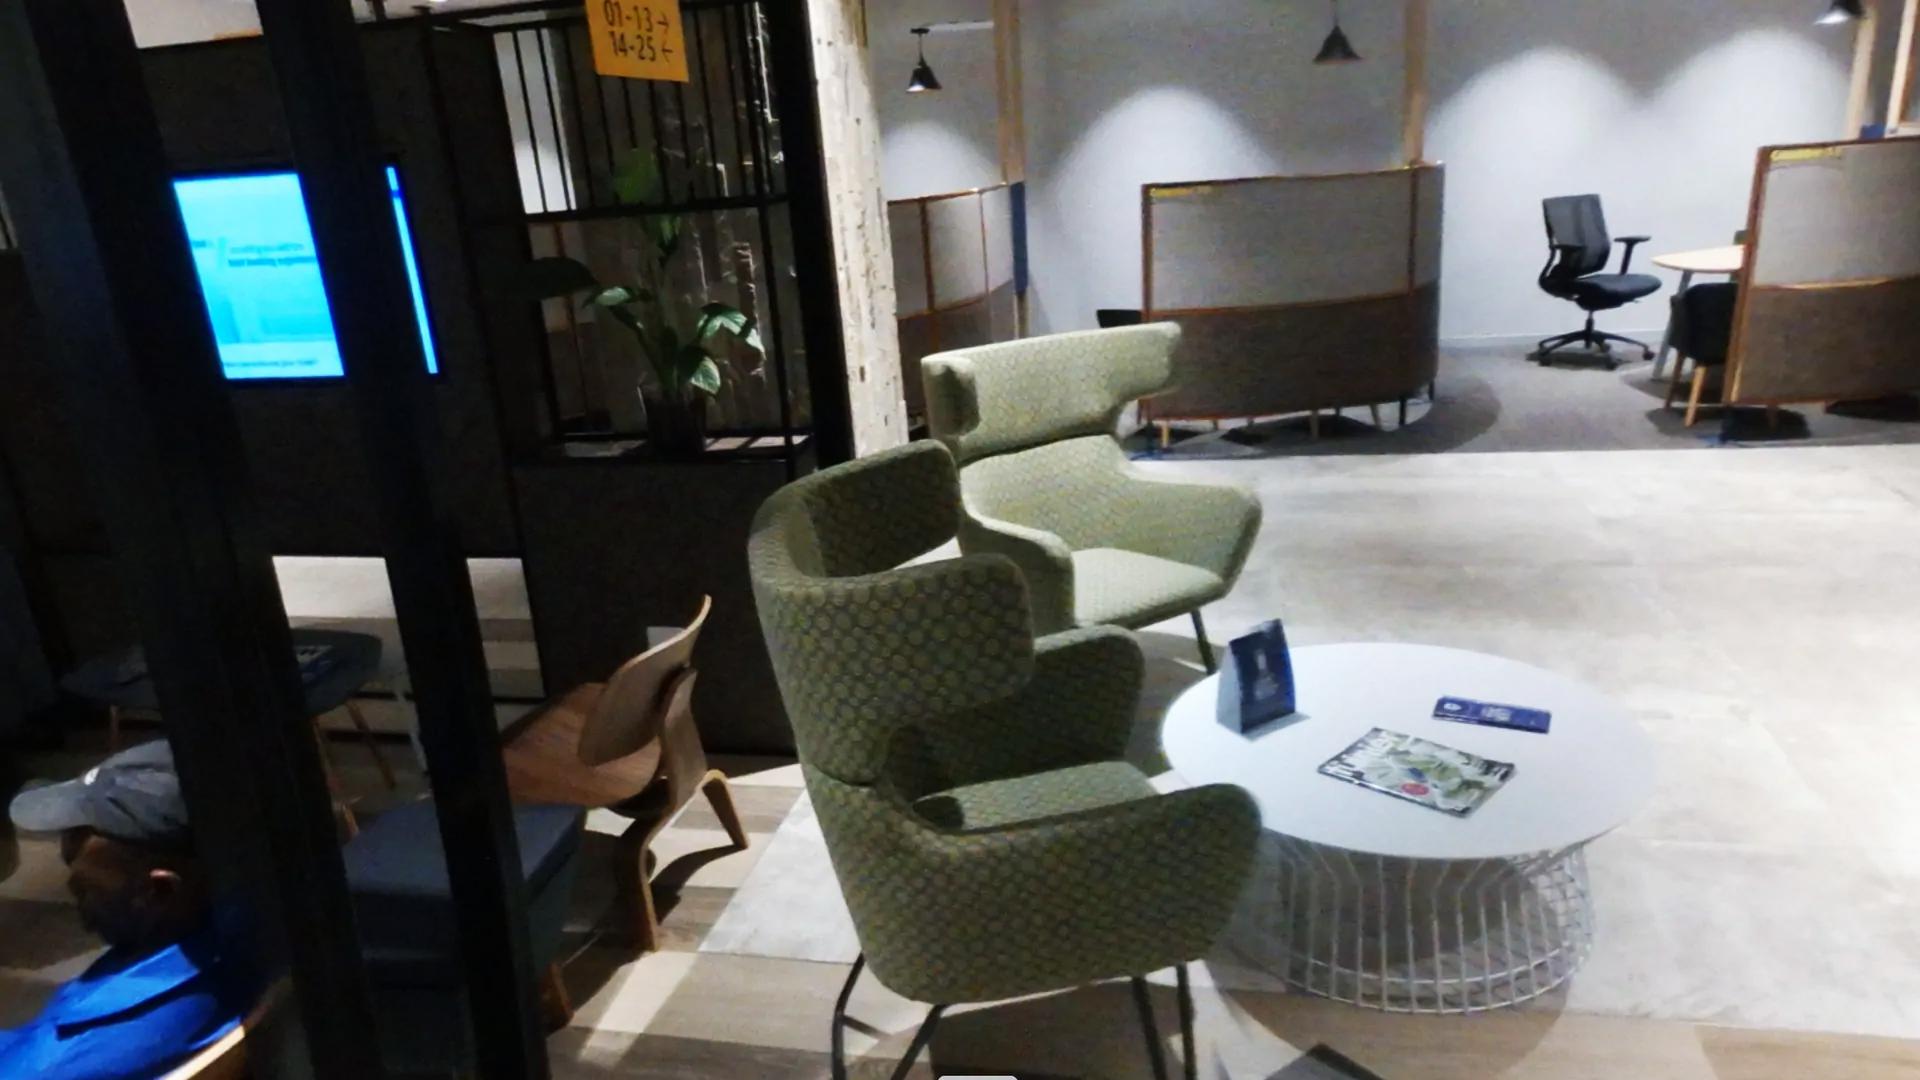 Furniture inside the Bank